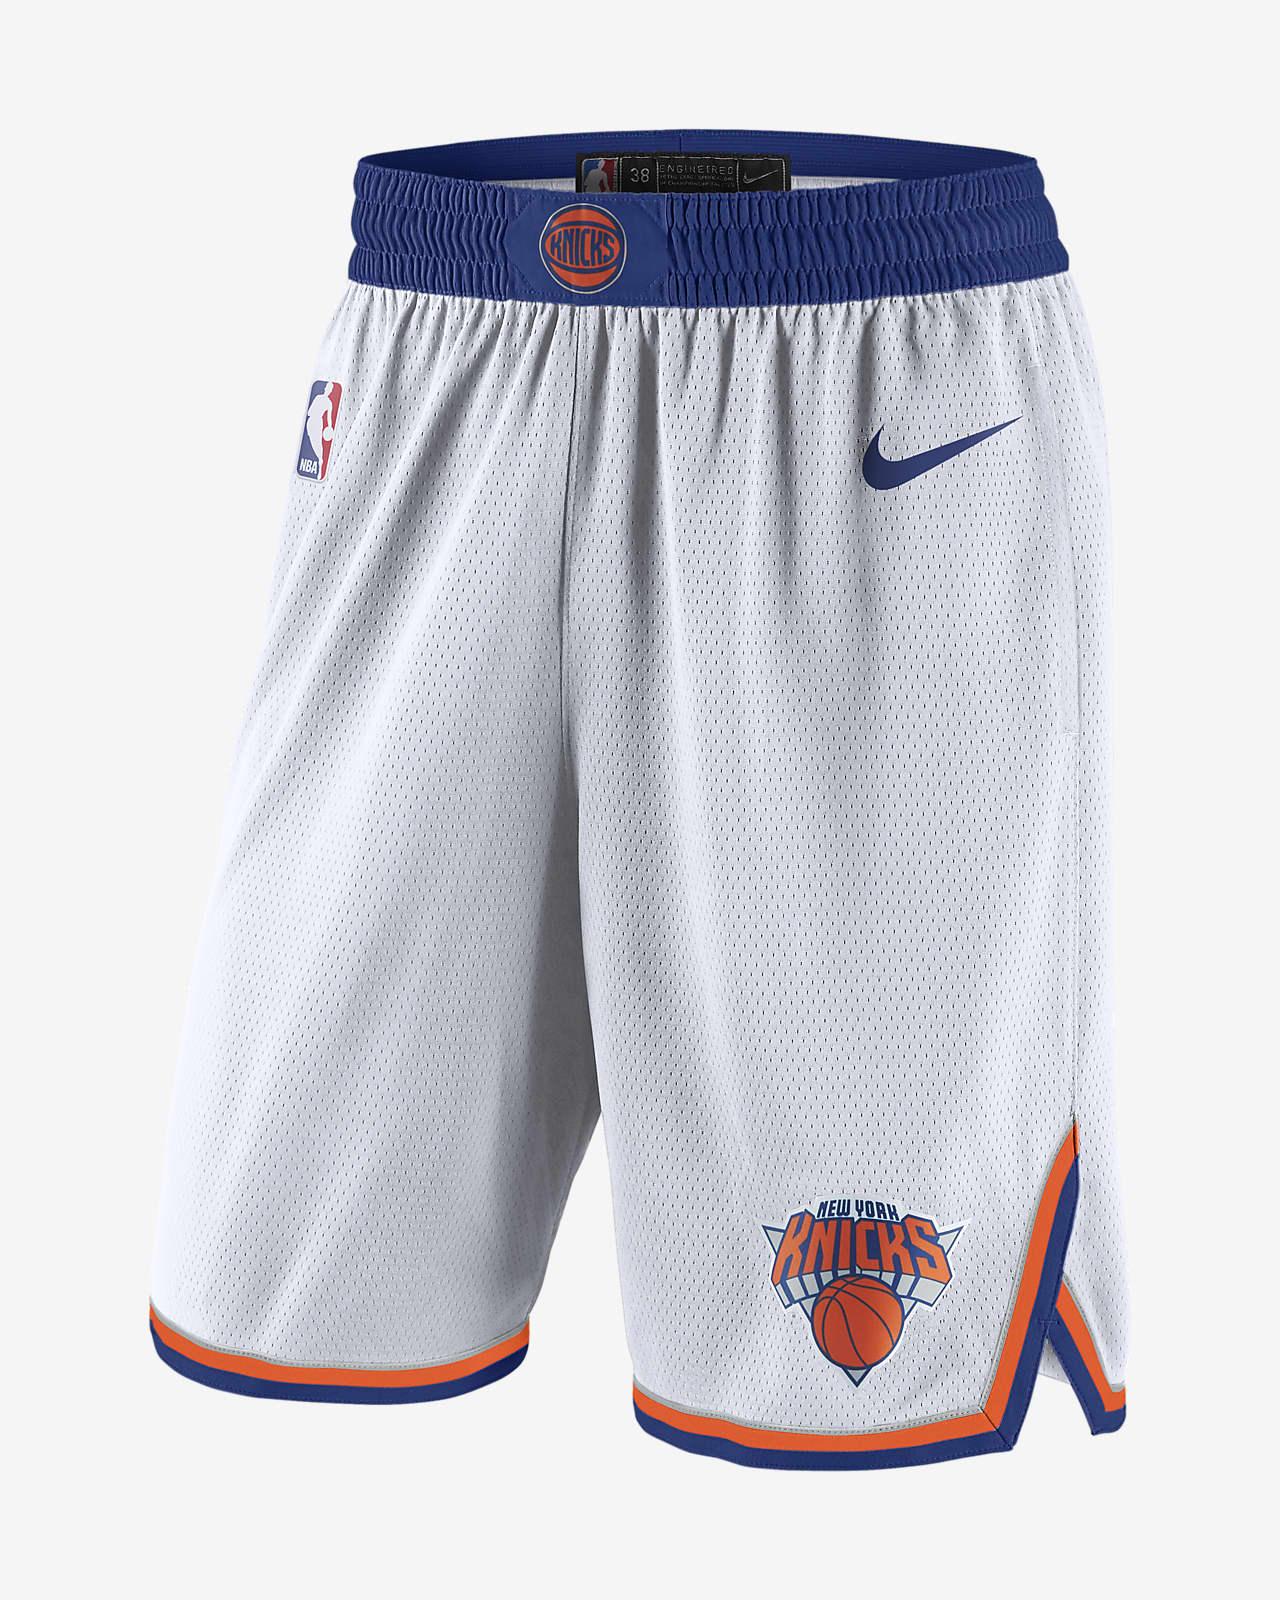 New York Knicks Men's Nike NBA Swingman